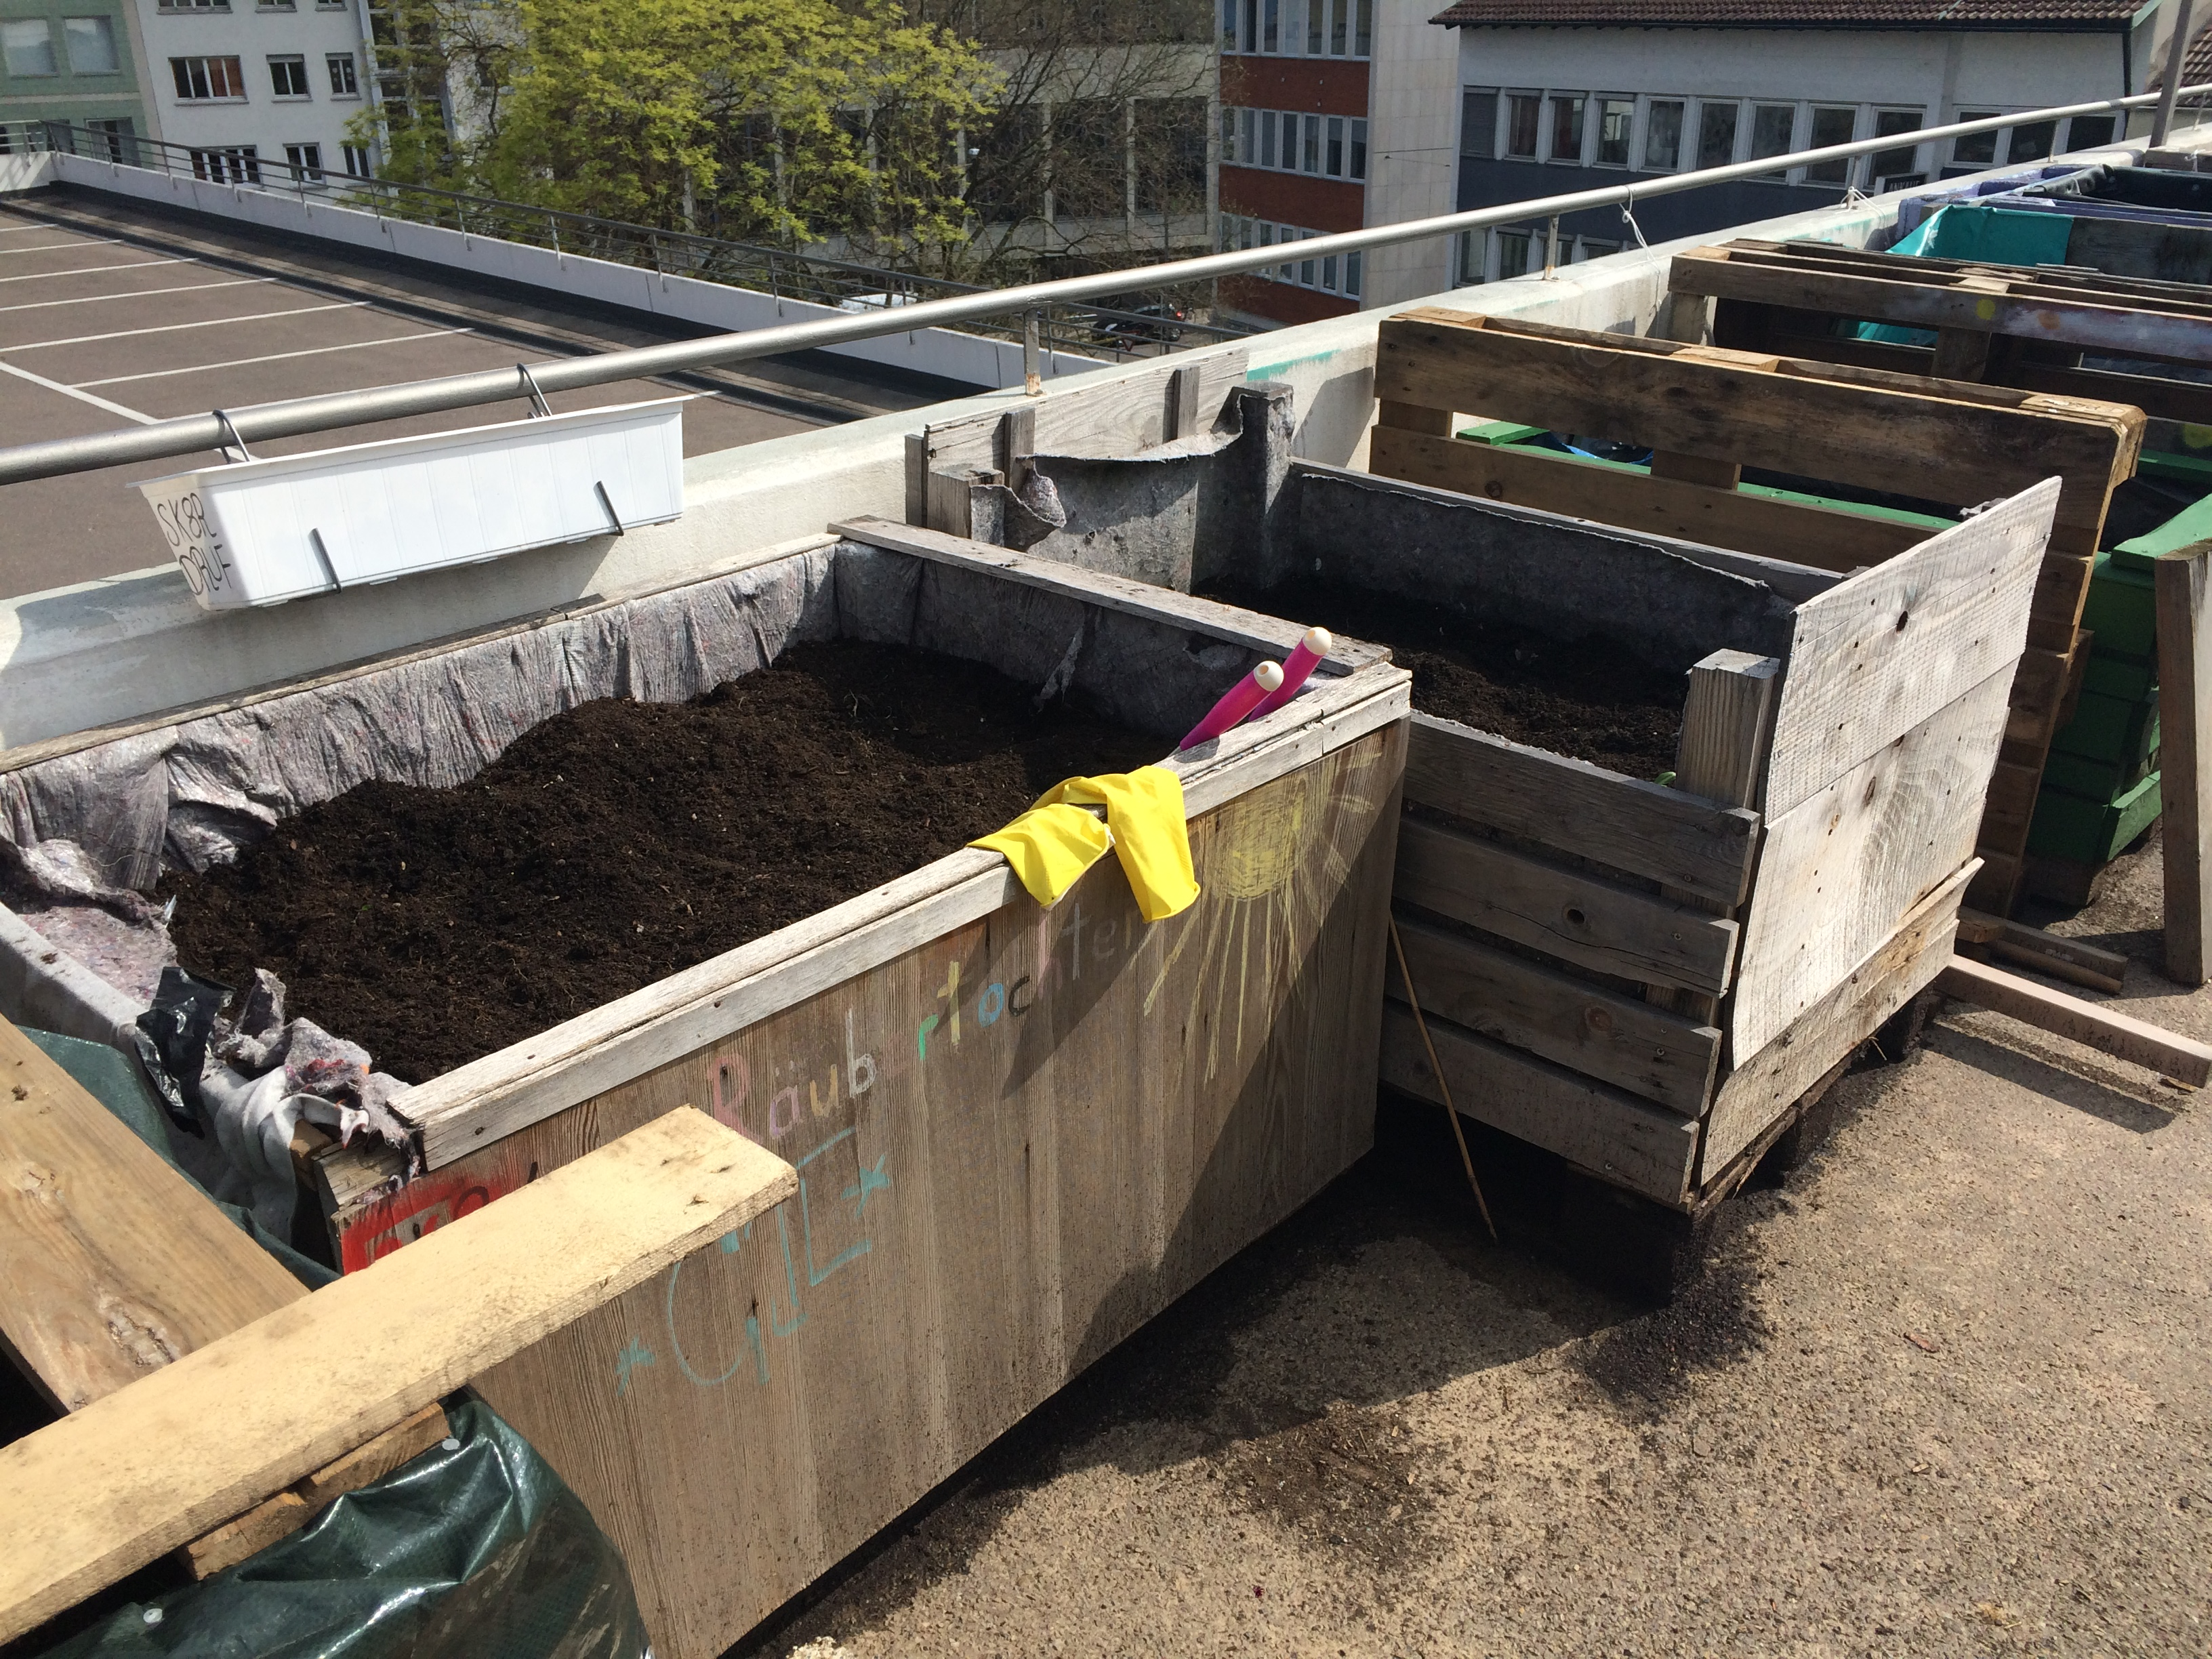 Urban Gardening Stuttgart Züblin Ebene 0